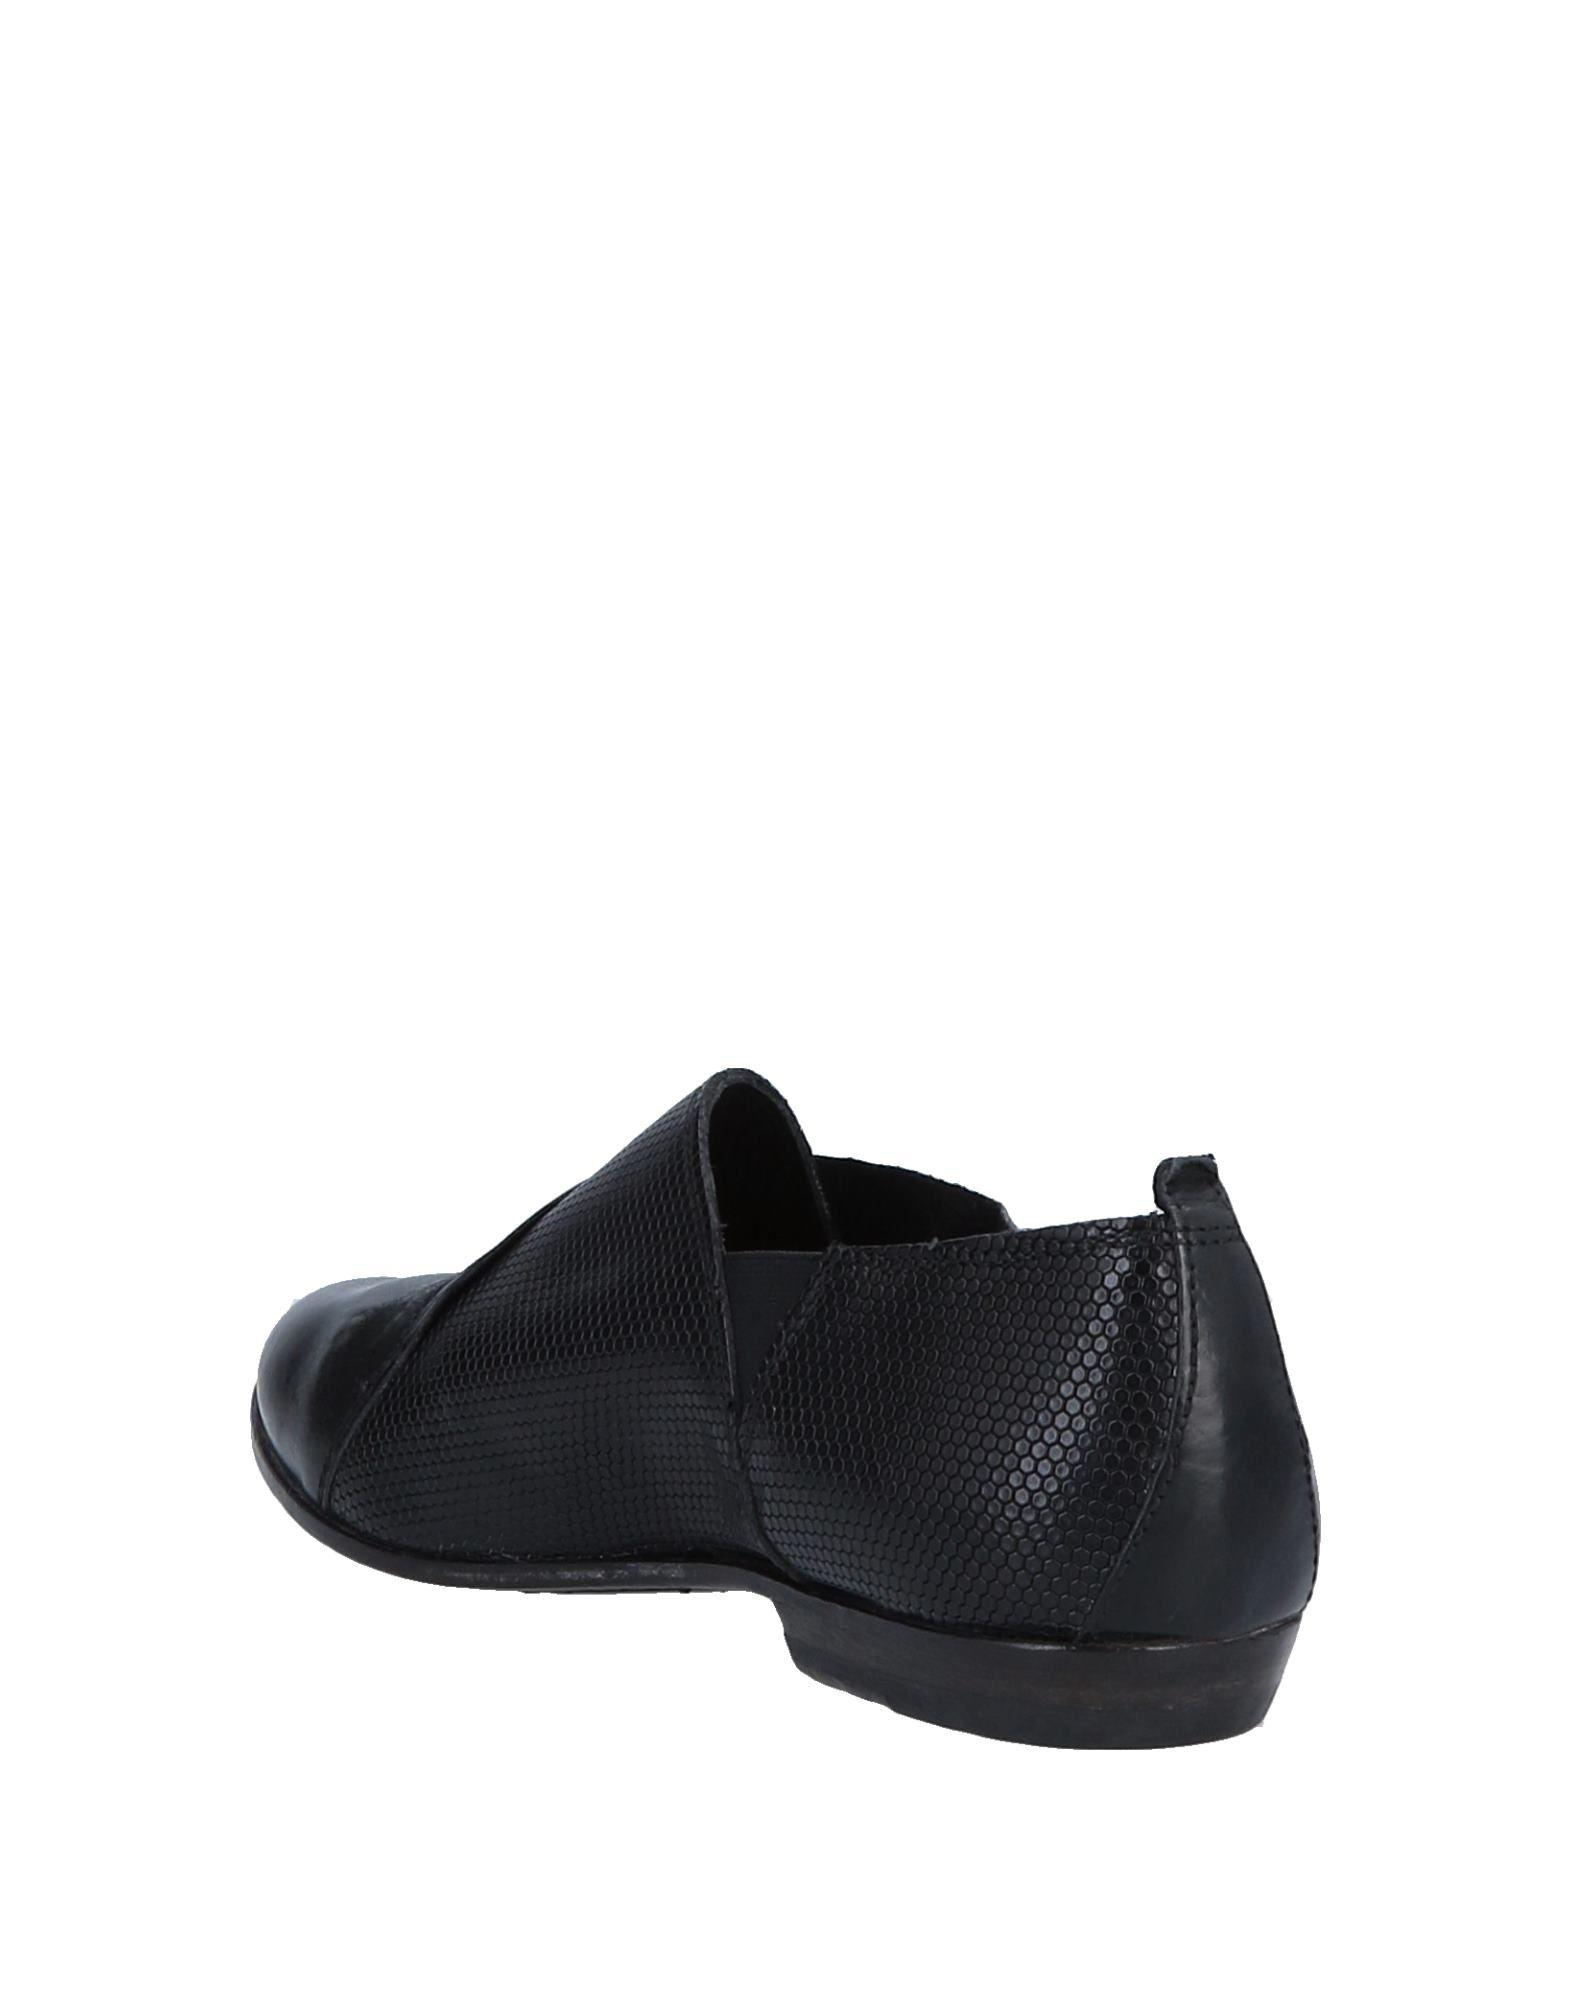 Stilvolle Moma billige Schuhe Moma Stilvolle Mokassins Damen  11563286GE 36623c